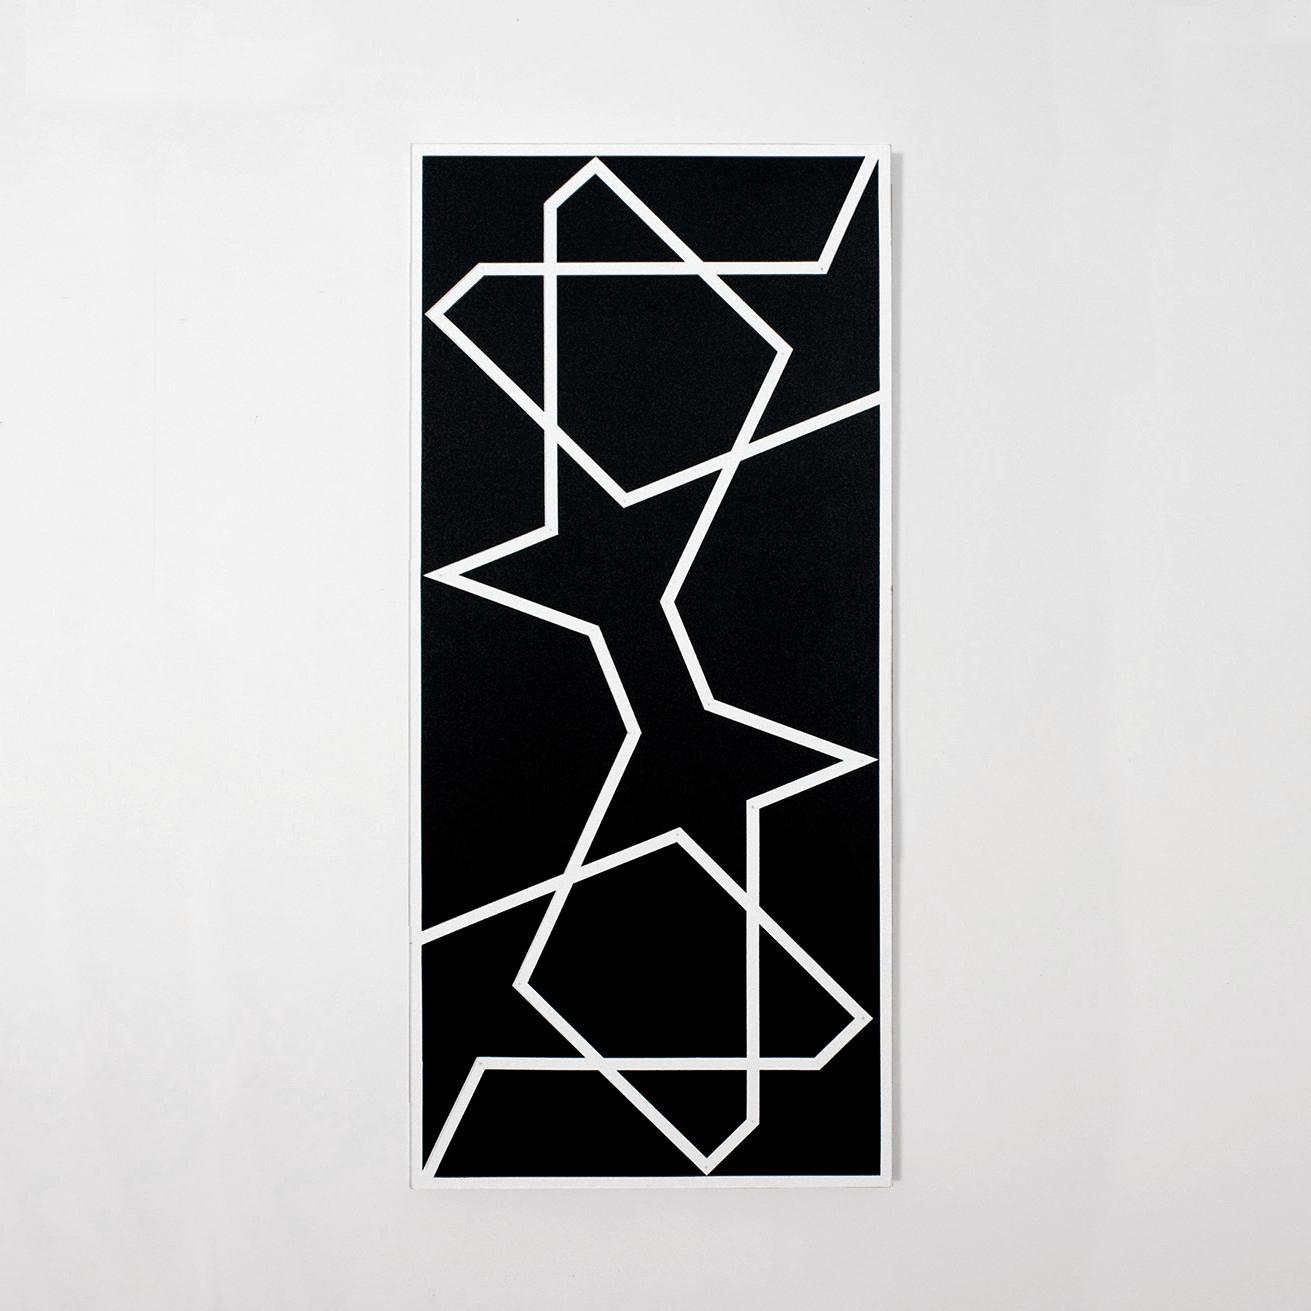 Topkapi XIV   2011. Acrylic on canvas. 60 x 25 in., 152.4 x 63.5 cm.